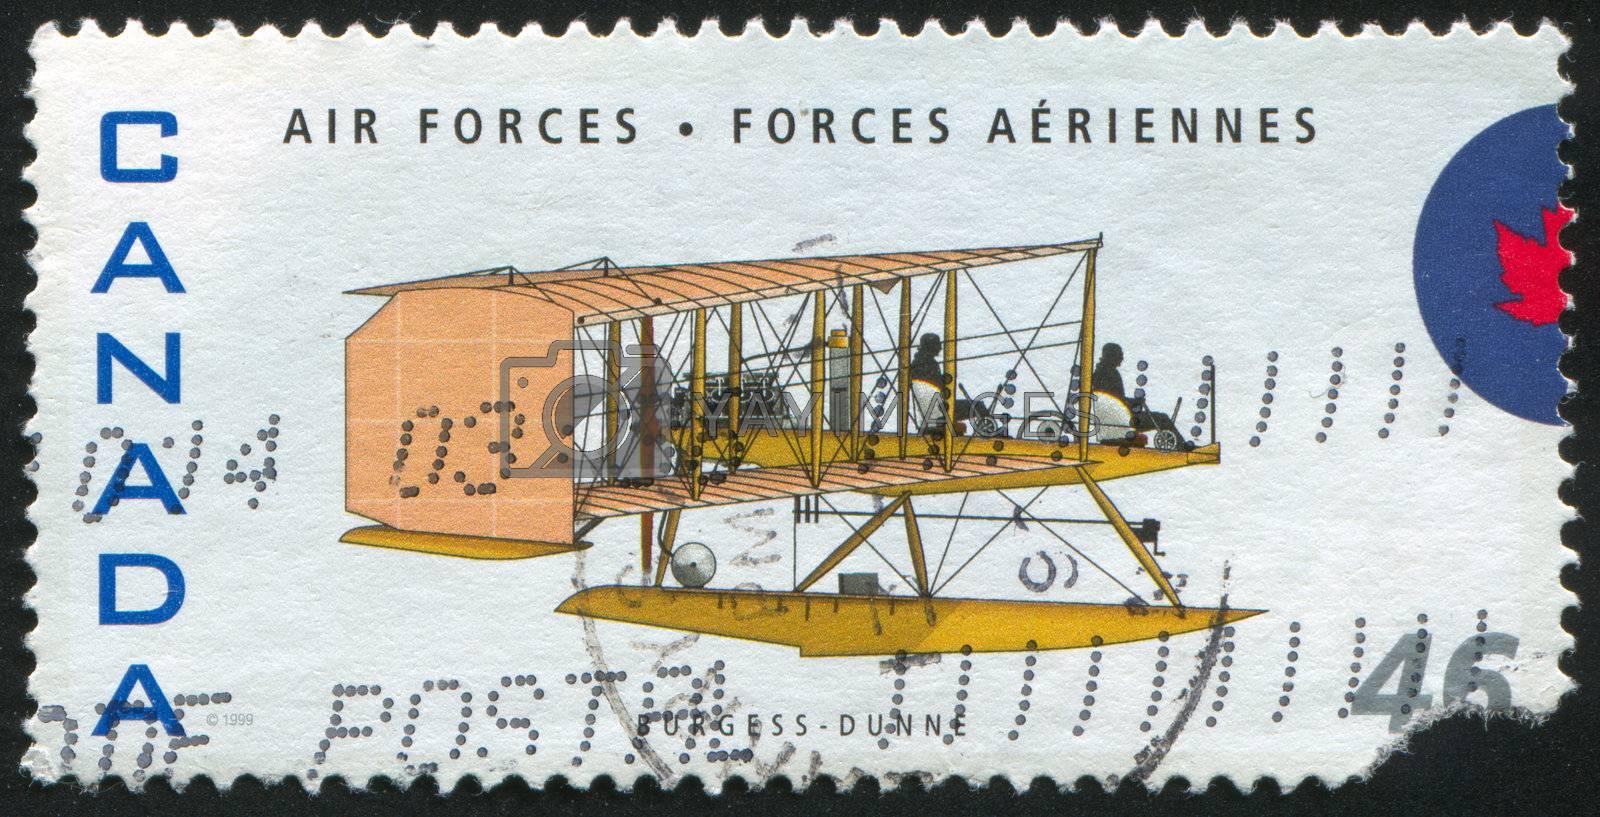 CANADA - CIRCA 1999: stamp printed by Canada, shows aeroplane, Burgess-Dunne seaplane,circa 1999